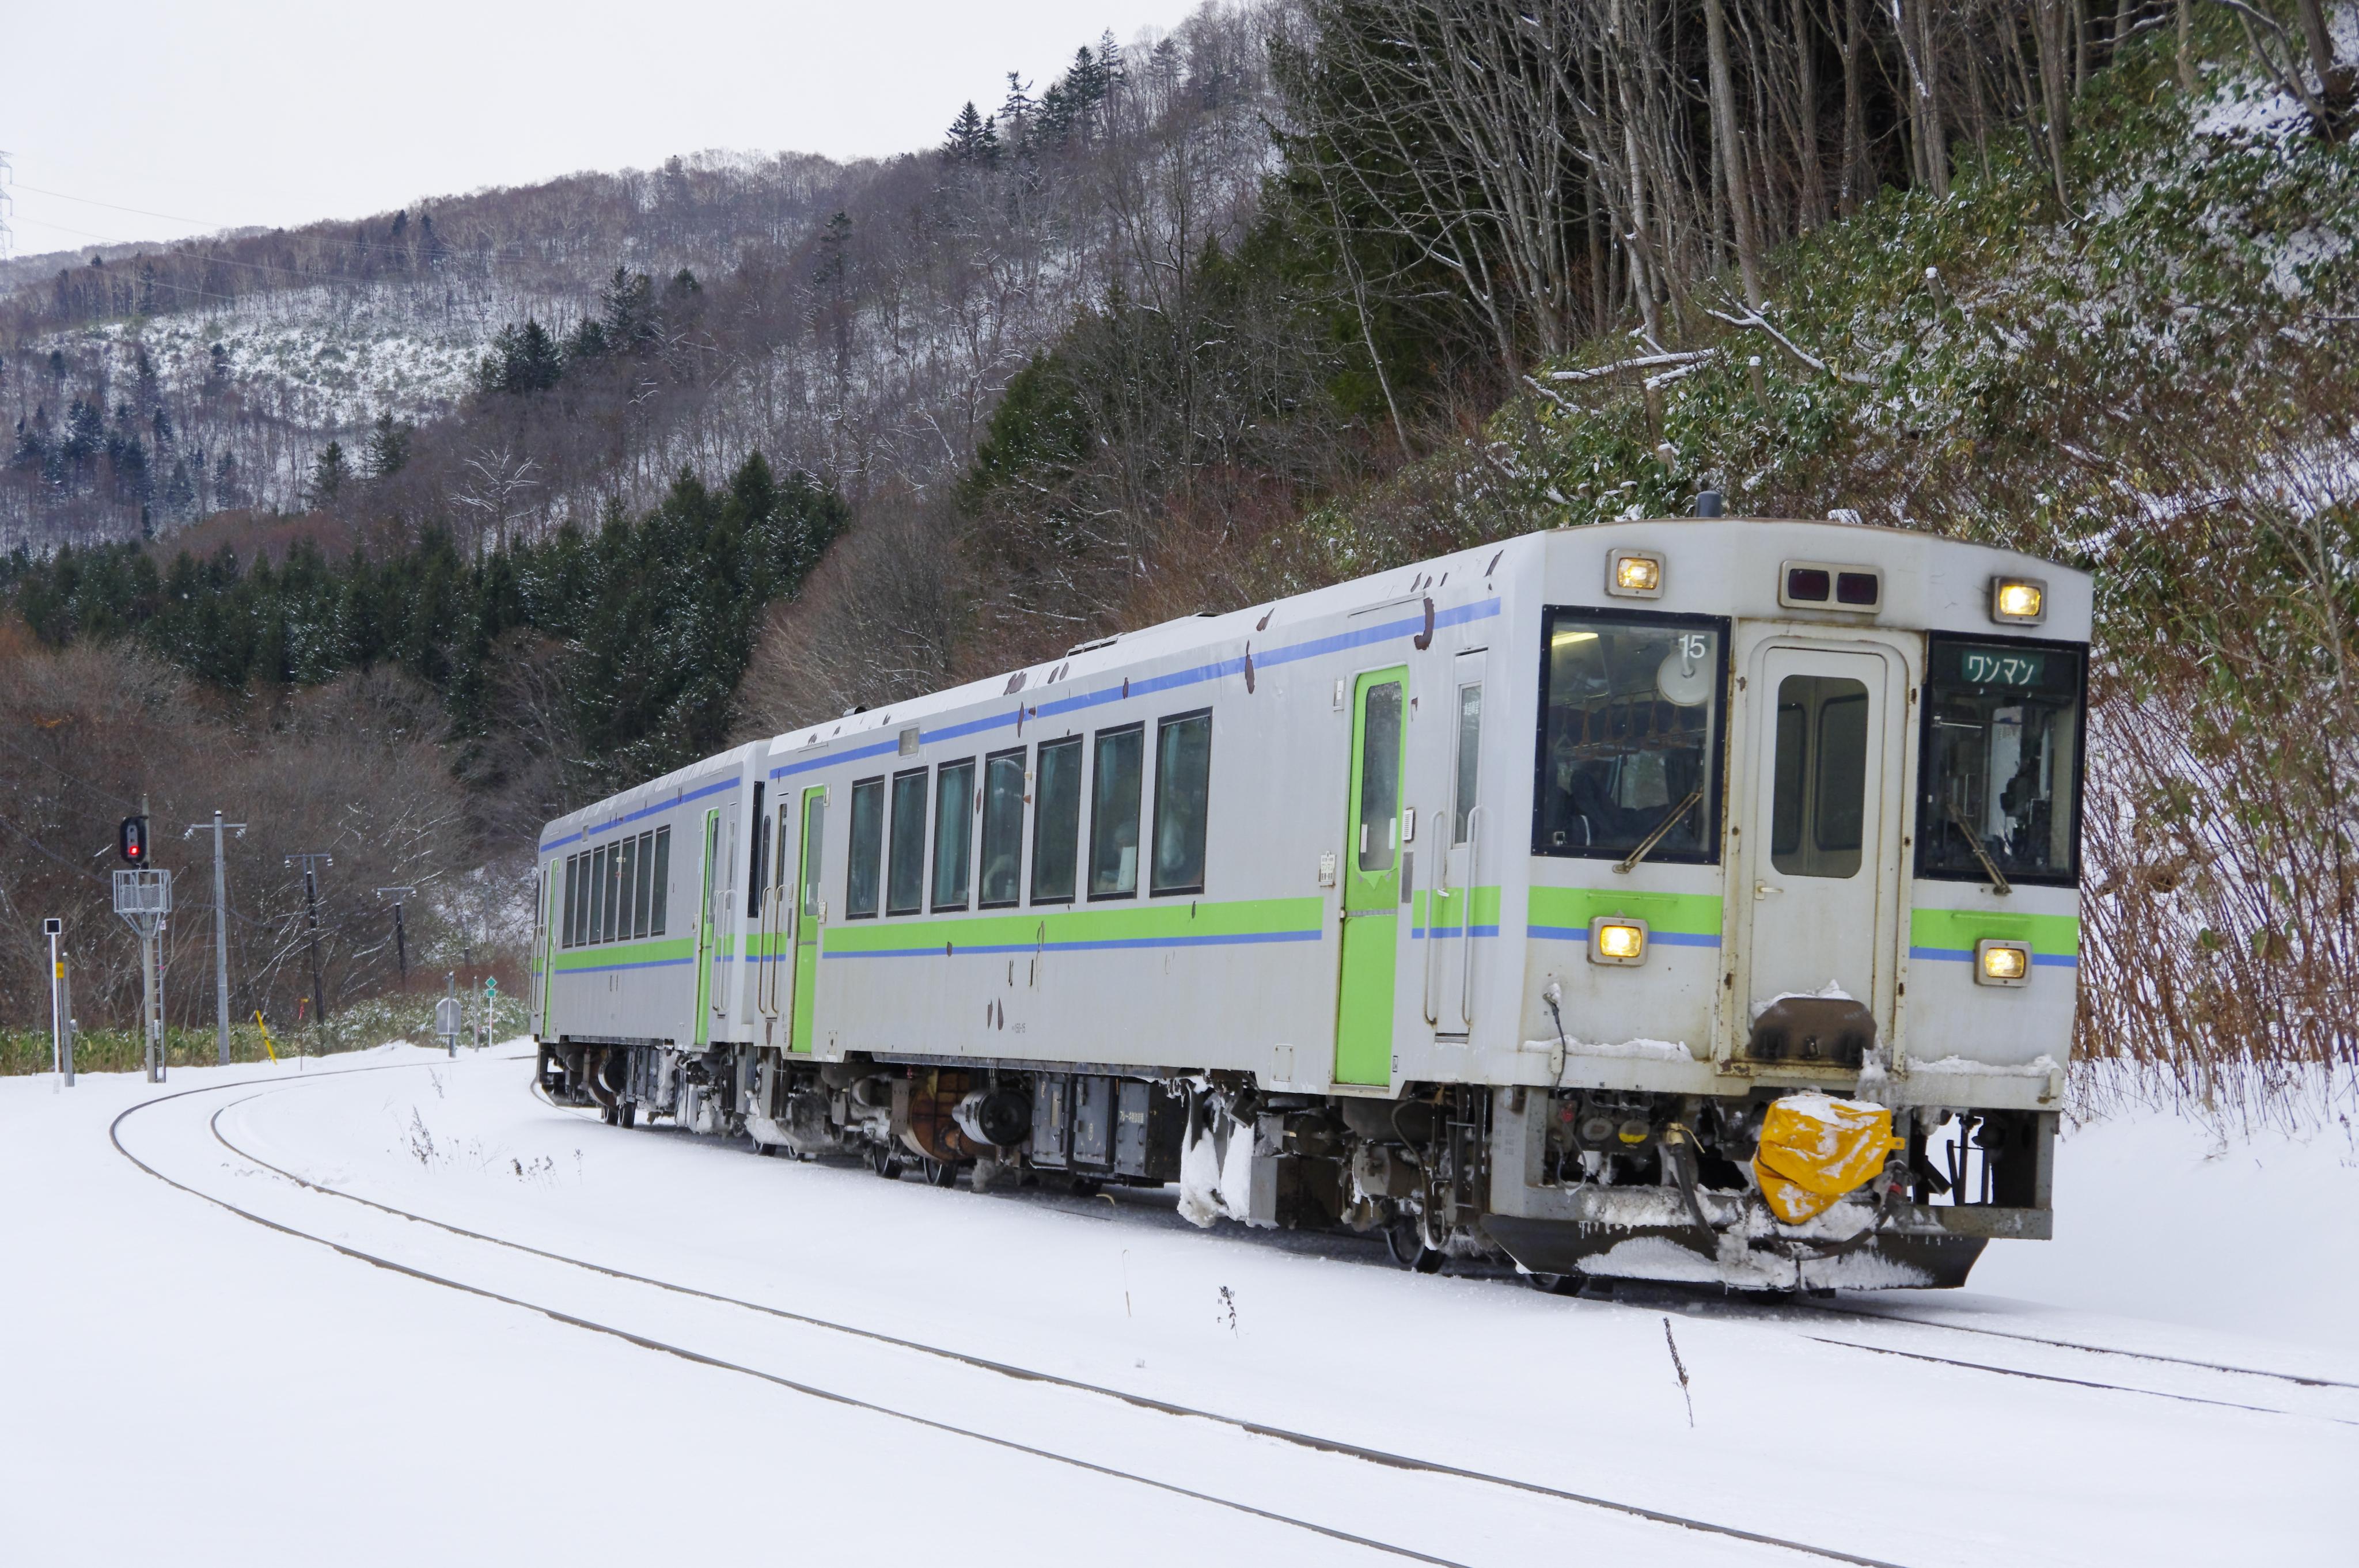 キハ150 1937D 銀山駅入線 191221.jpg